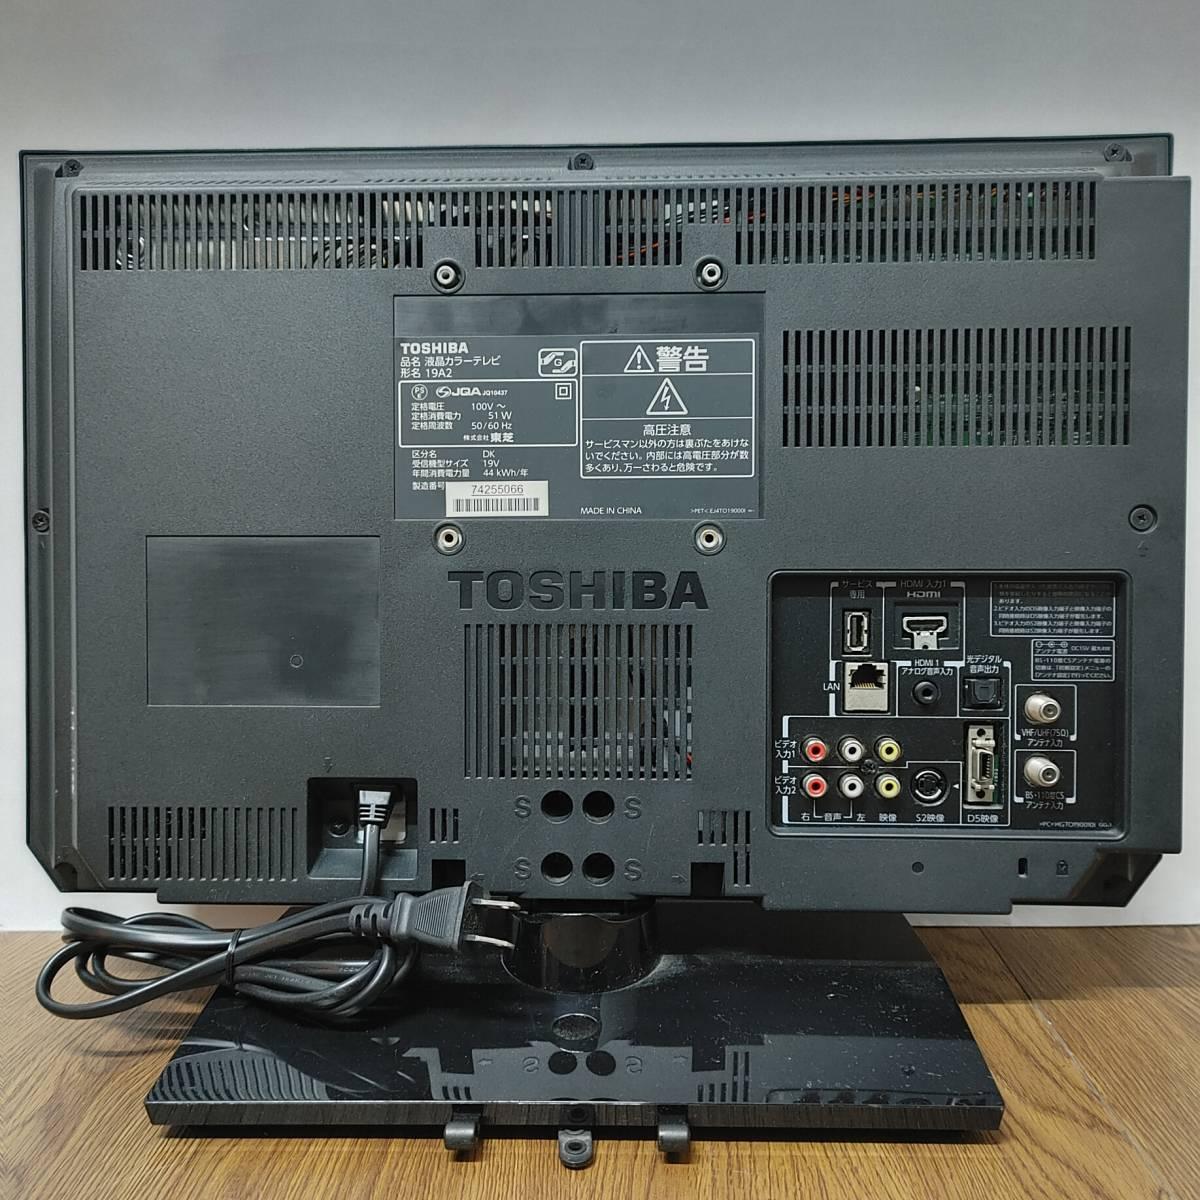 TOSHIBA REGZA 東芝 19V型 液晶テレビ 19A2 2011年製 B-CASカード レグザ 東芝 _画像7